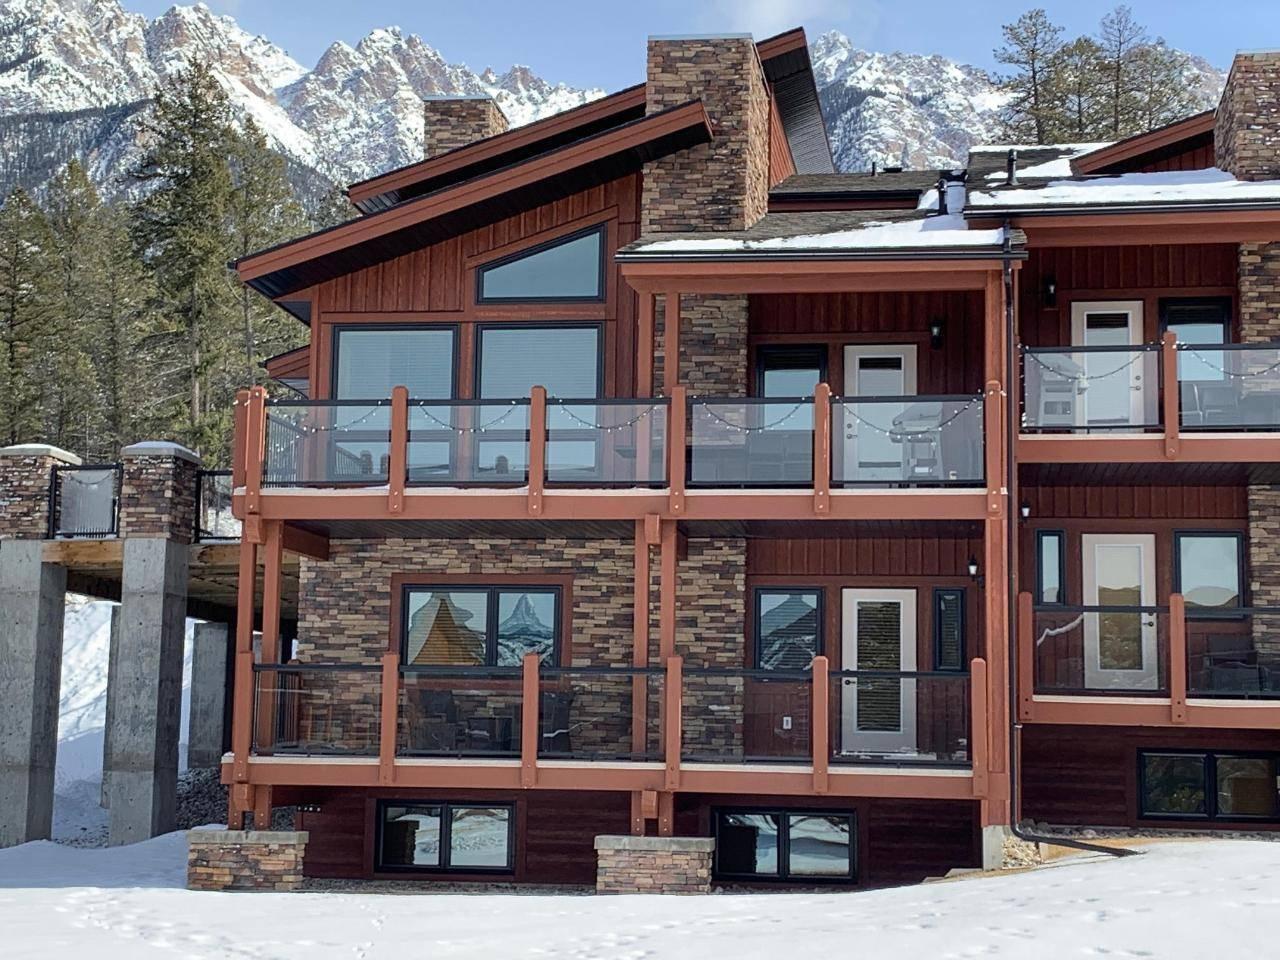 Townhouse for sale at 5150 Fairway Drive  Unit 6 Fairmont/columbia Lake British Columbia - MLS: 2450625